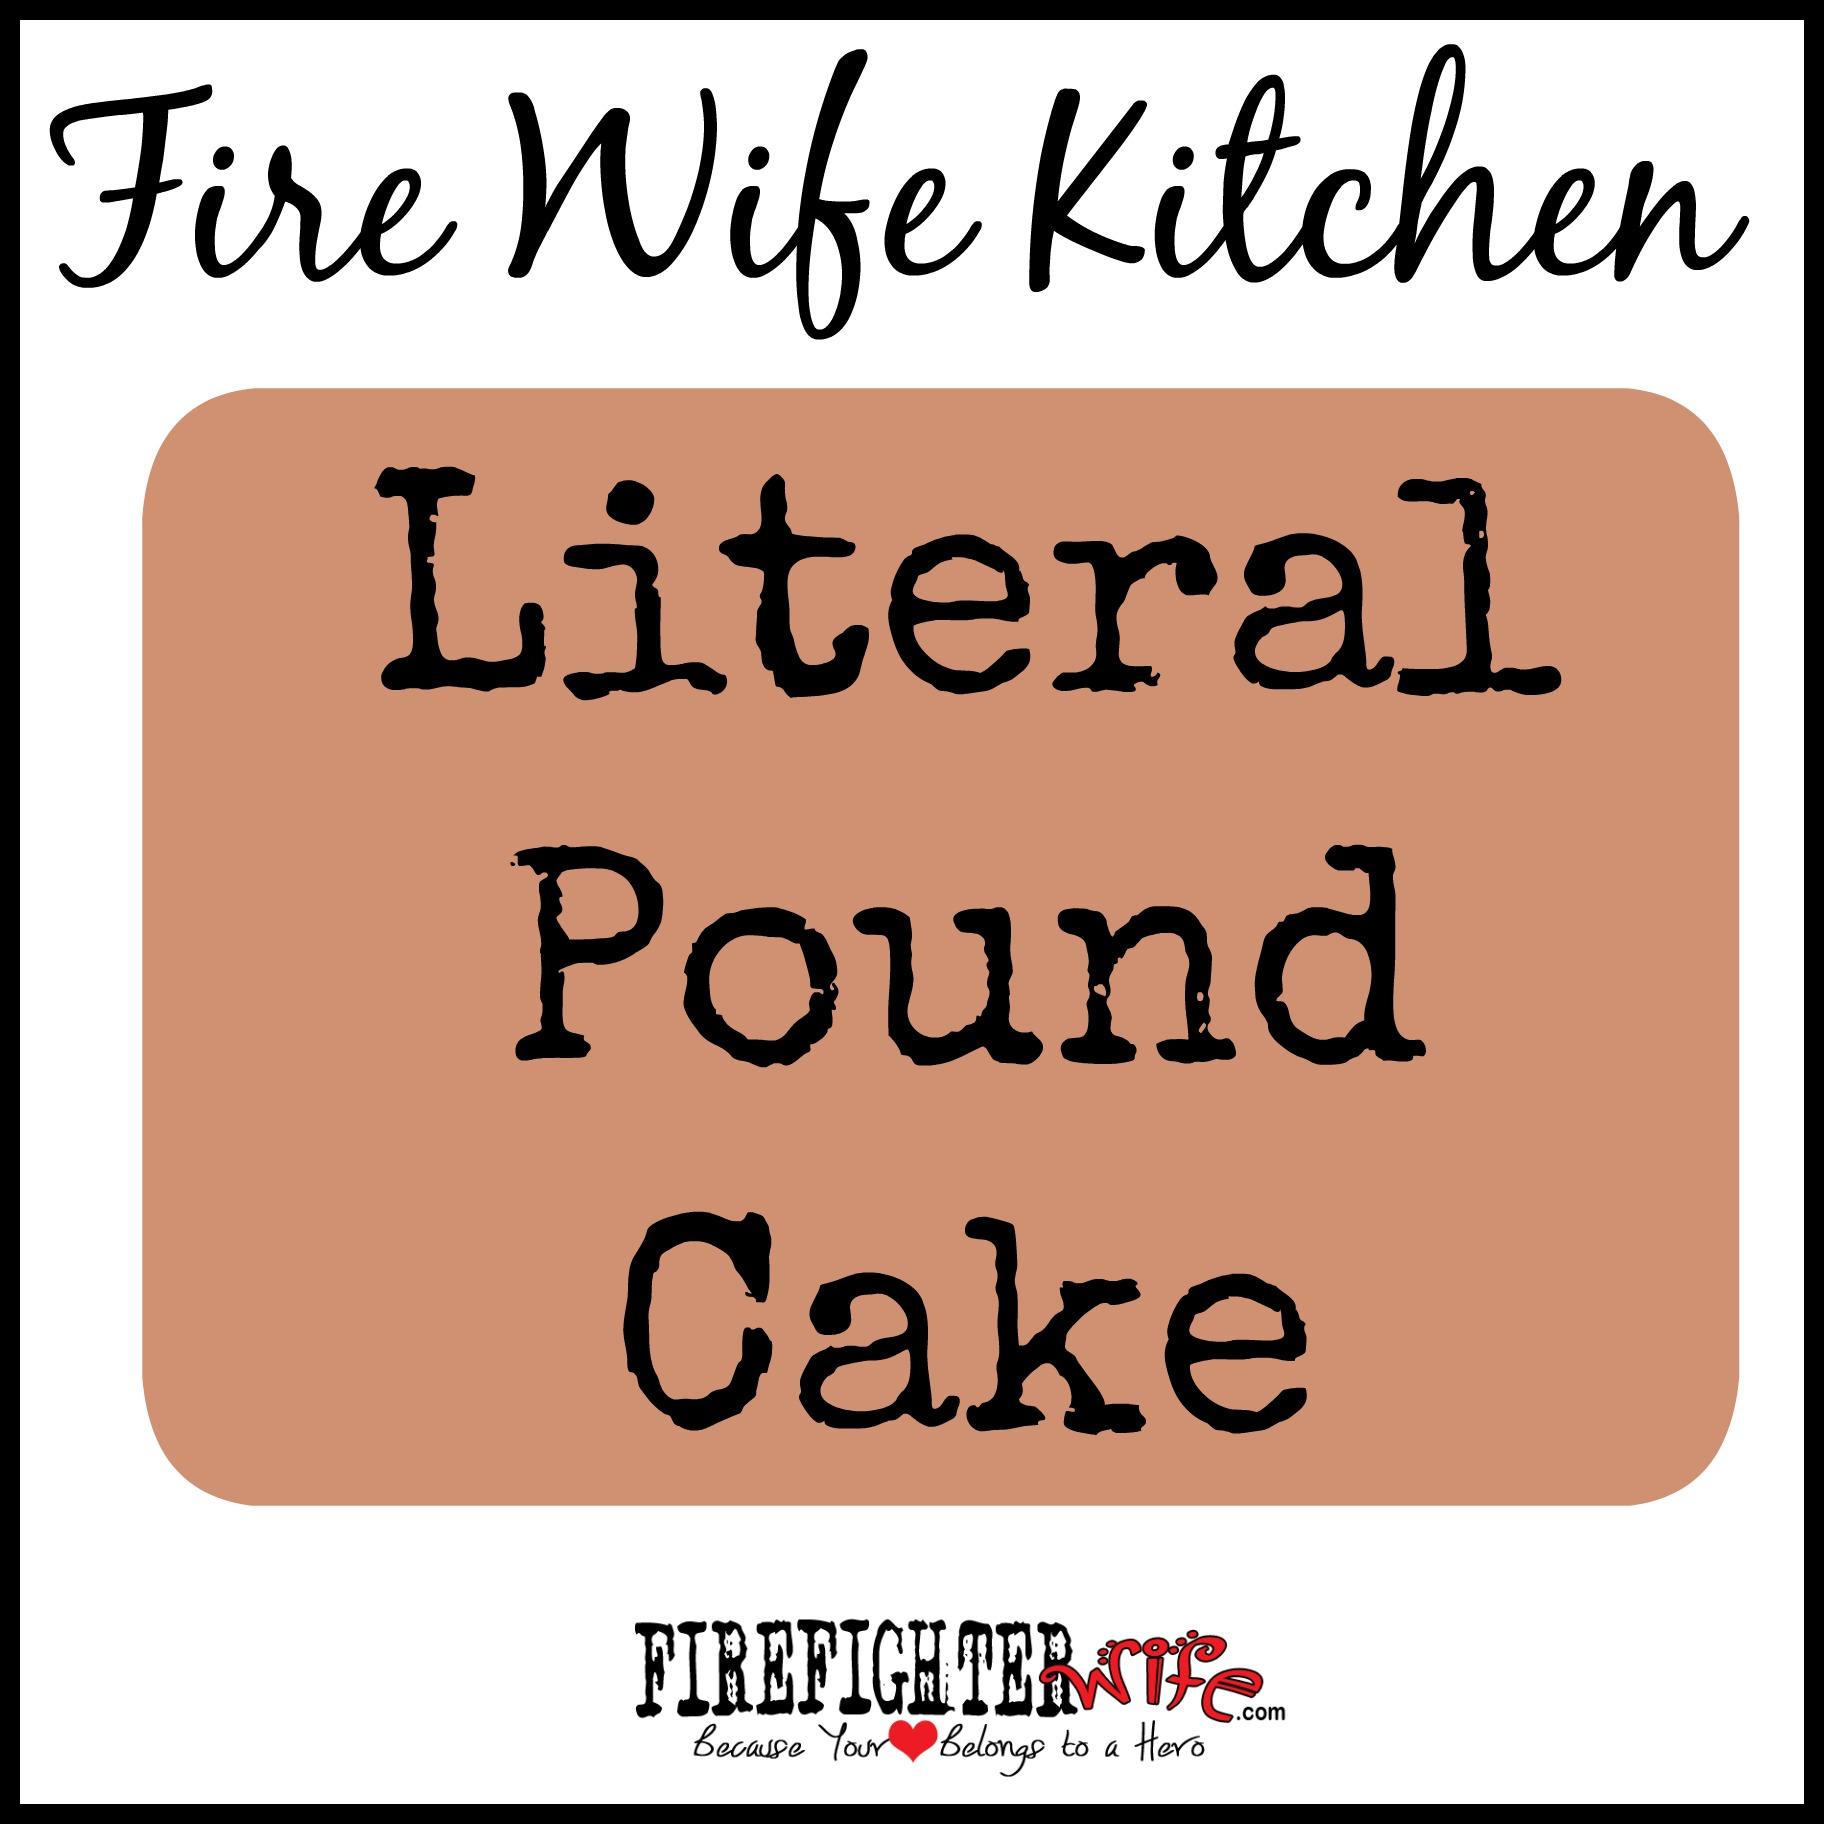 Literal Pound Cake